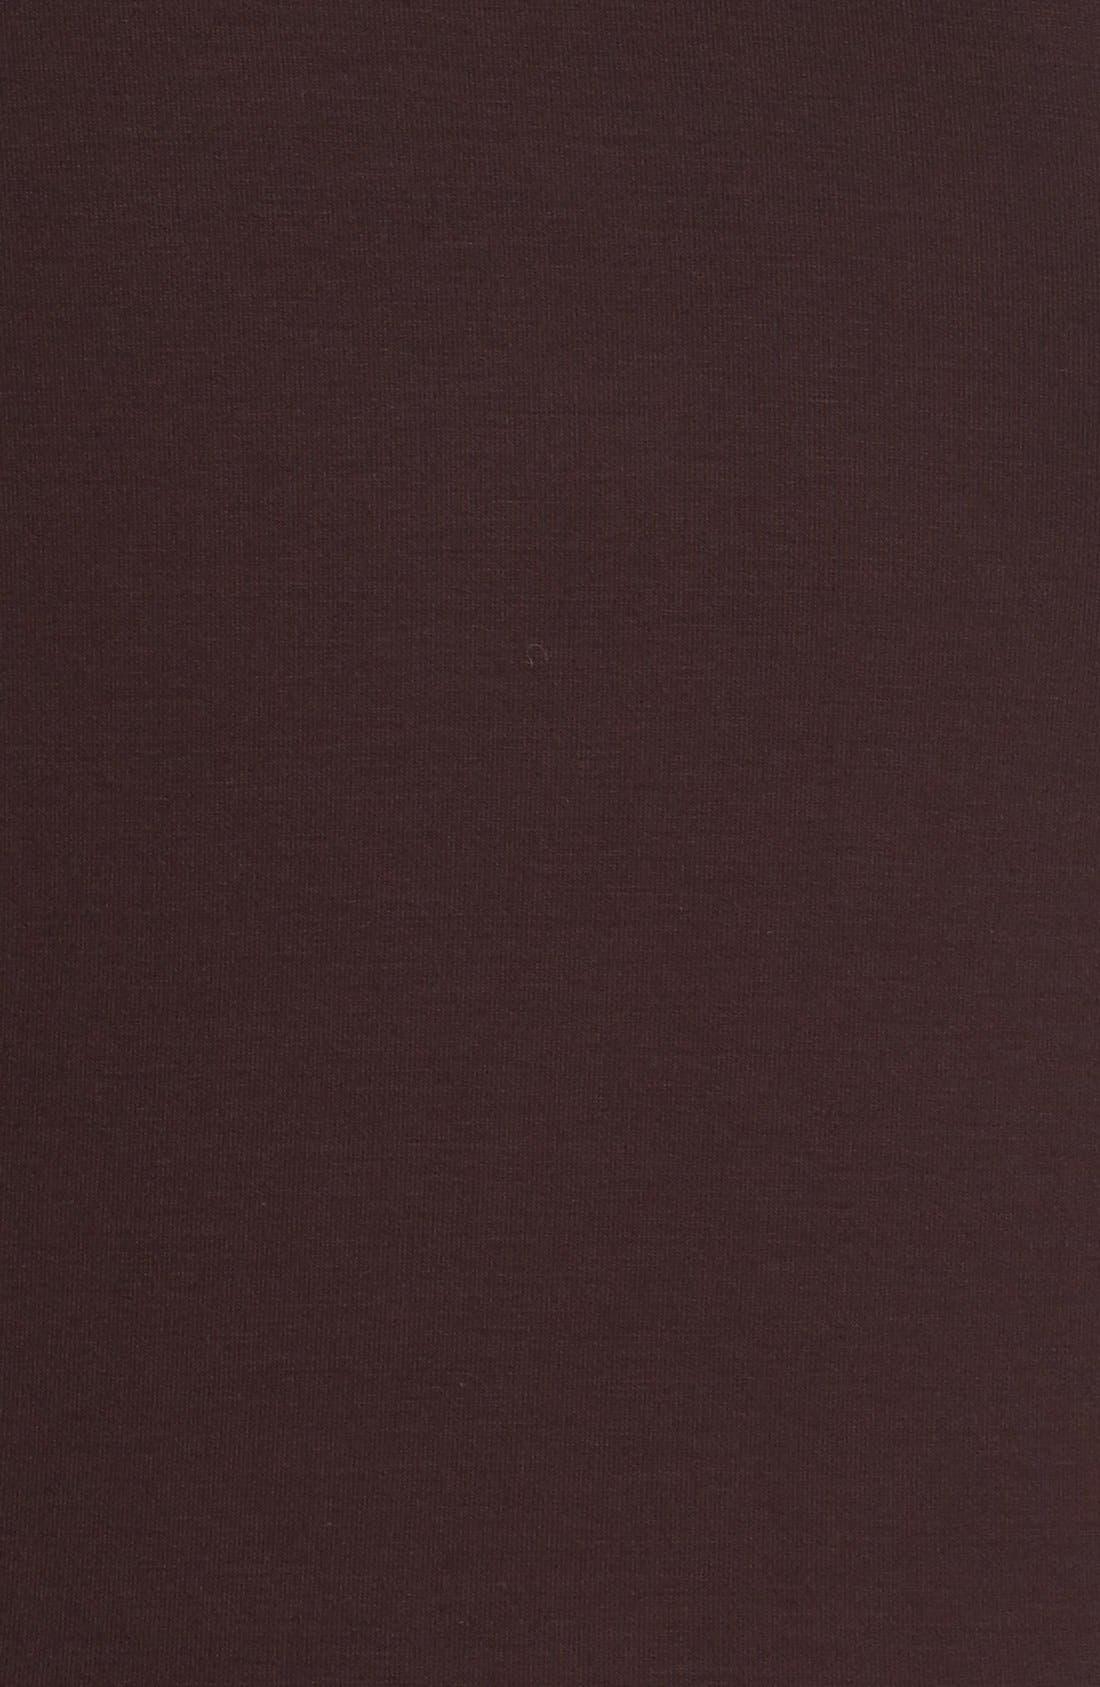 Long Sleeve Crewneck Top,                             Alternate thumbnail 35, color,